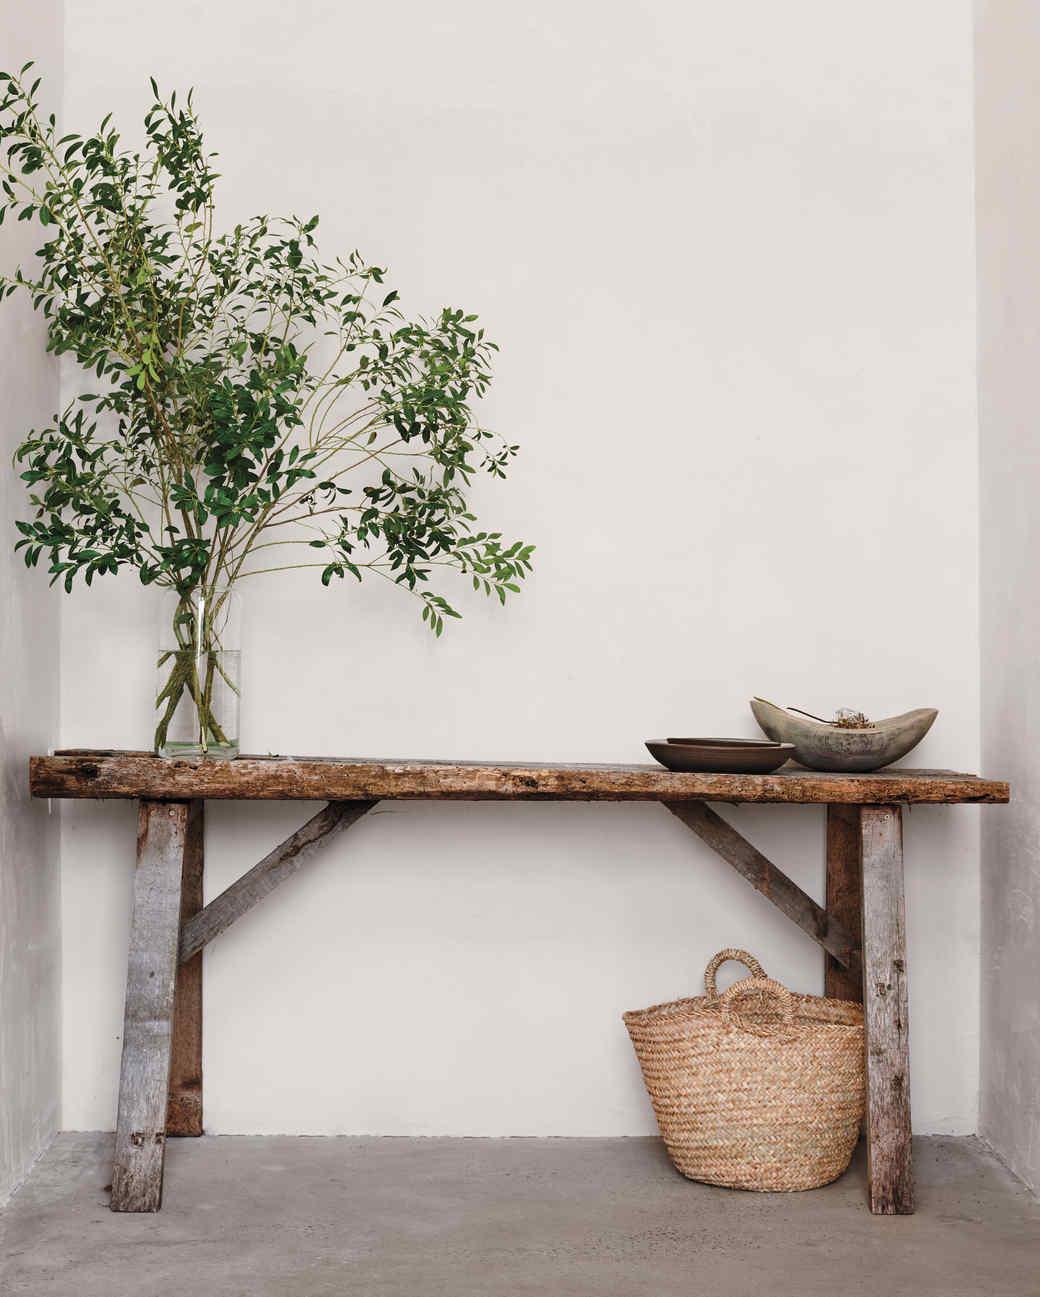 kelli-cain-ceramicist-home-0023-d112172.jpg